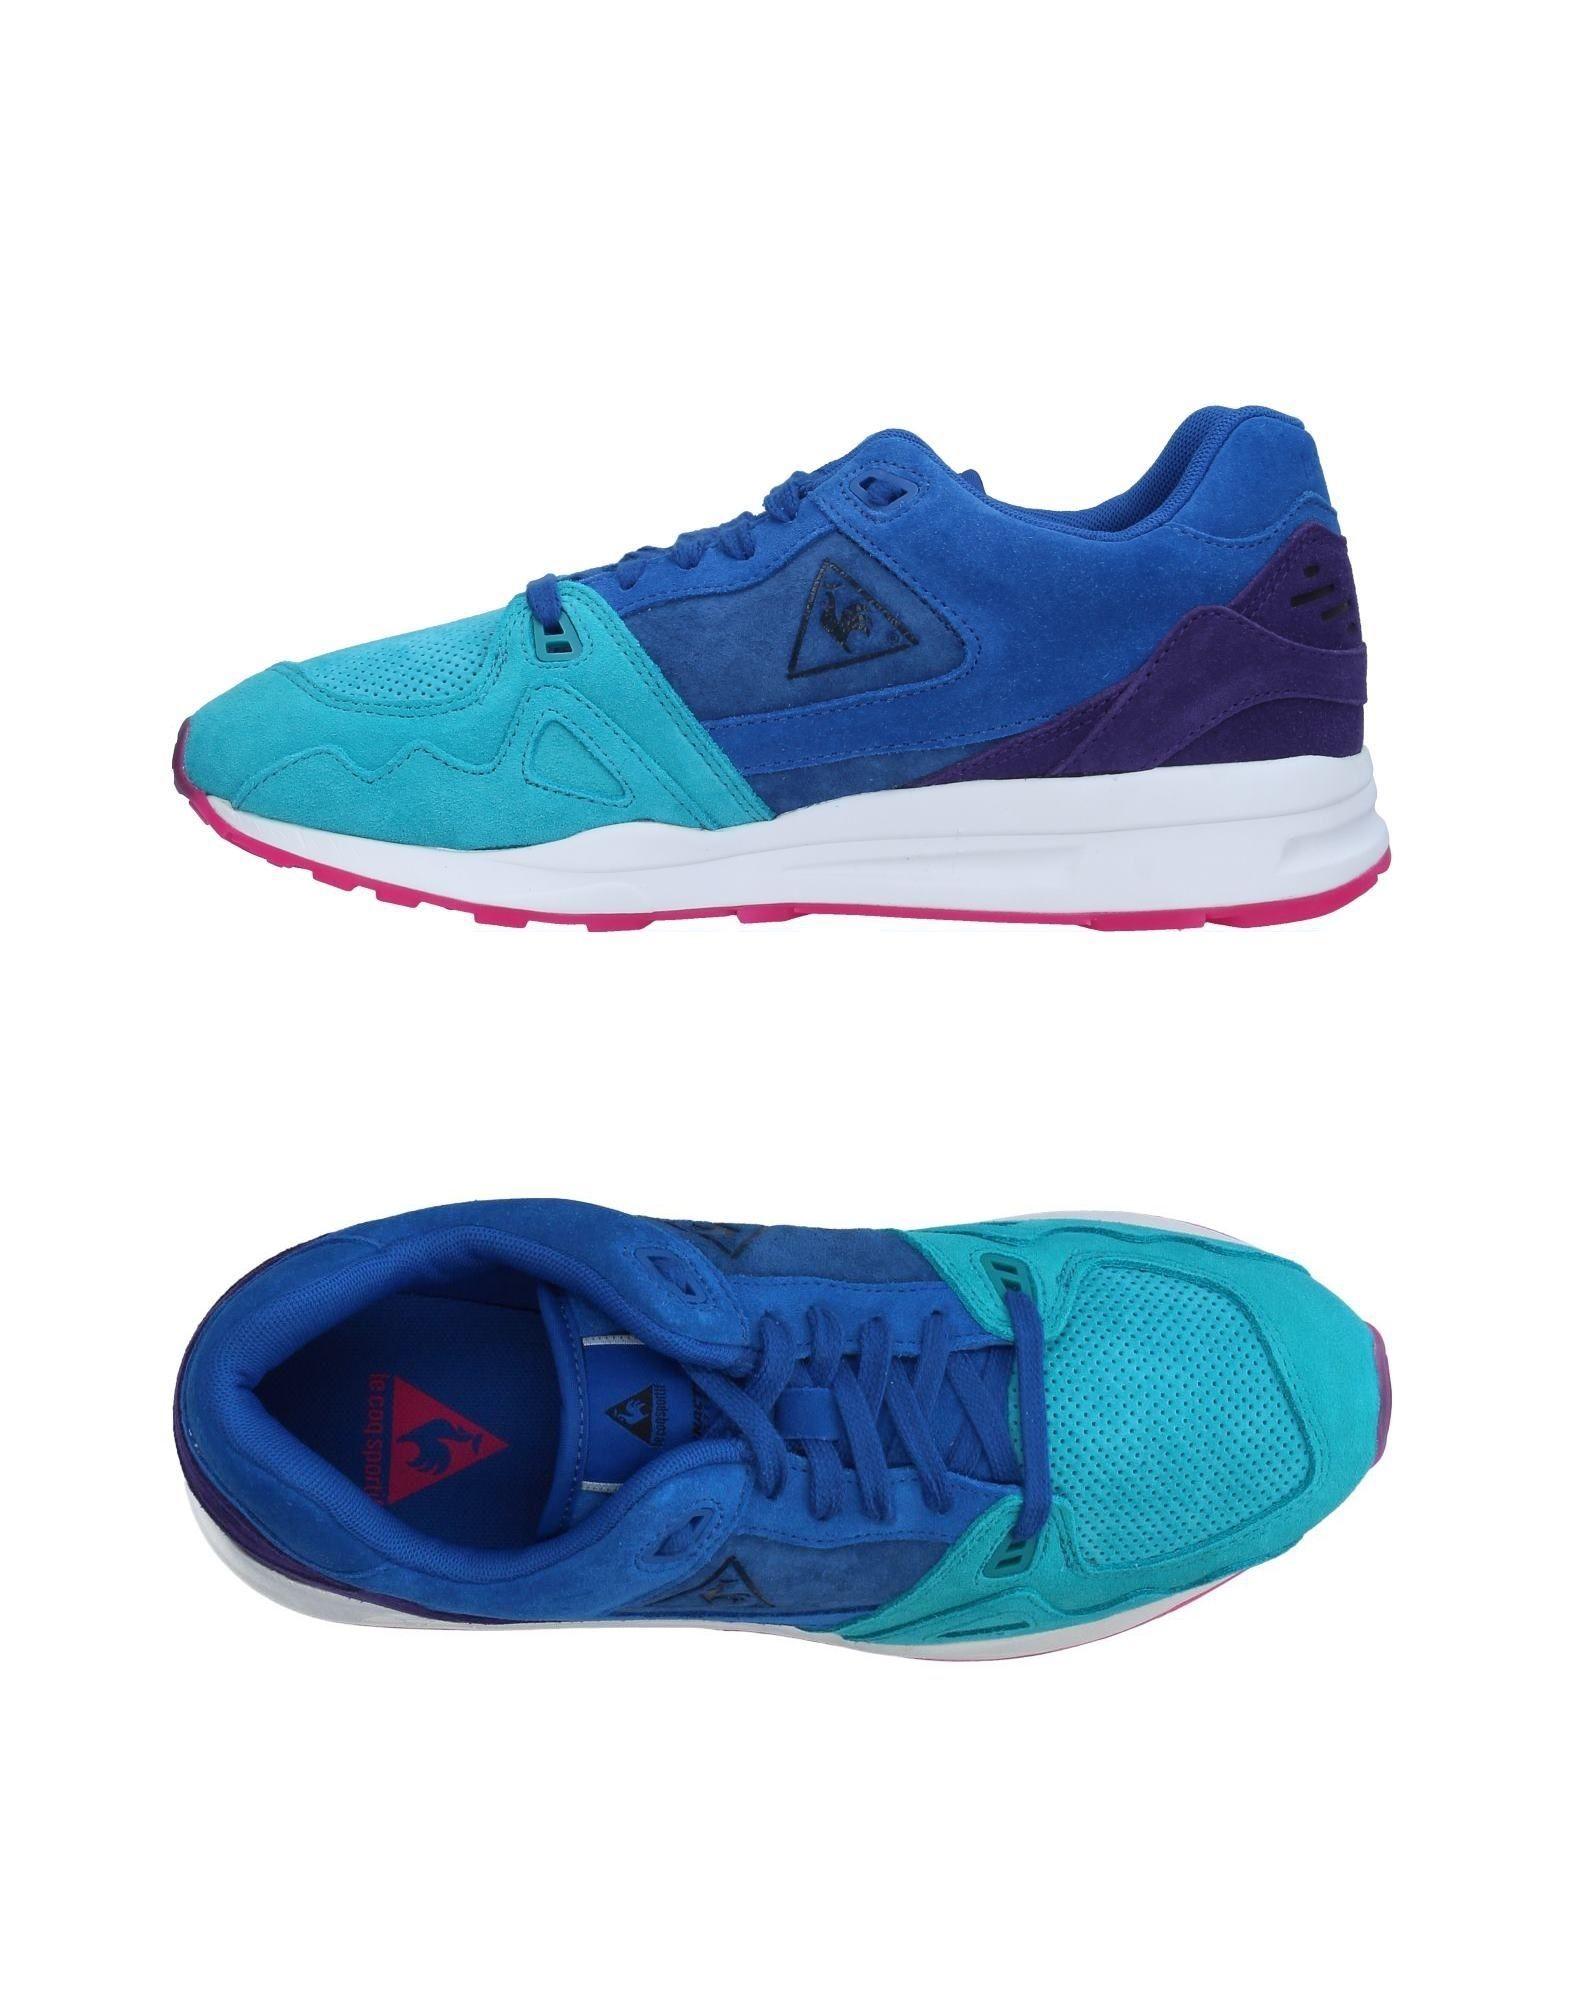 Le Coq Sportif Sneakers Herren  11341061BV Neue Schuhe